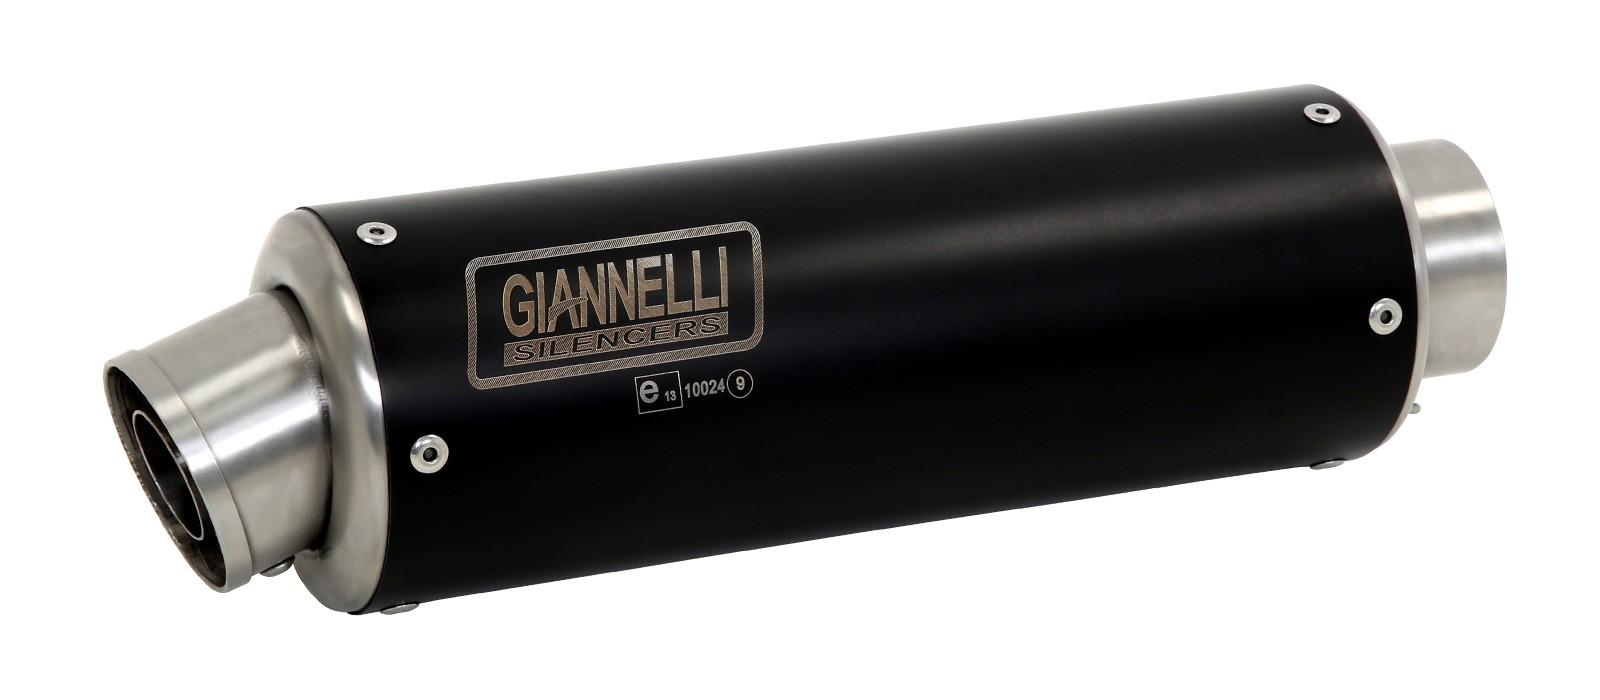 ESCAPES GIANNELLI KAWASAKI - Slip-on nicrom black (derecha + izquierda) X-PRO Kawasaki Z 1000 Giannelli 73516XP -